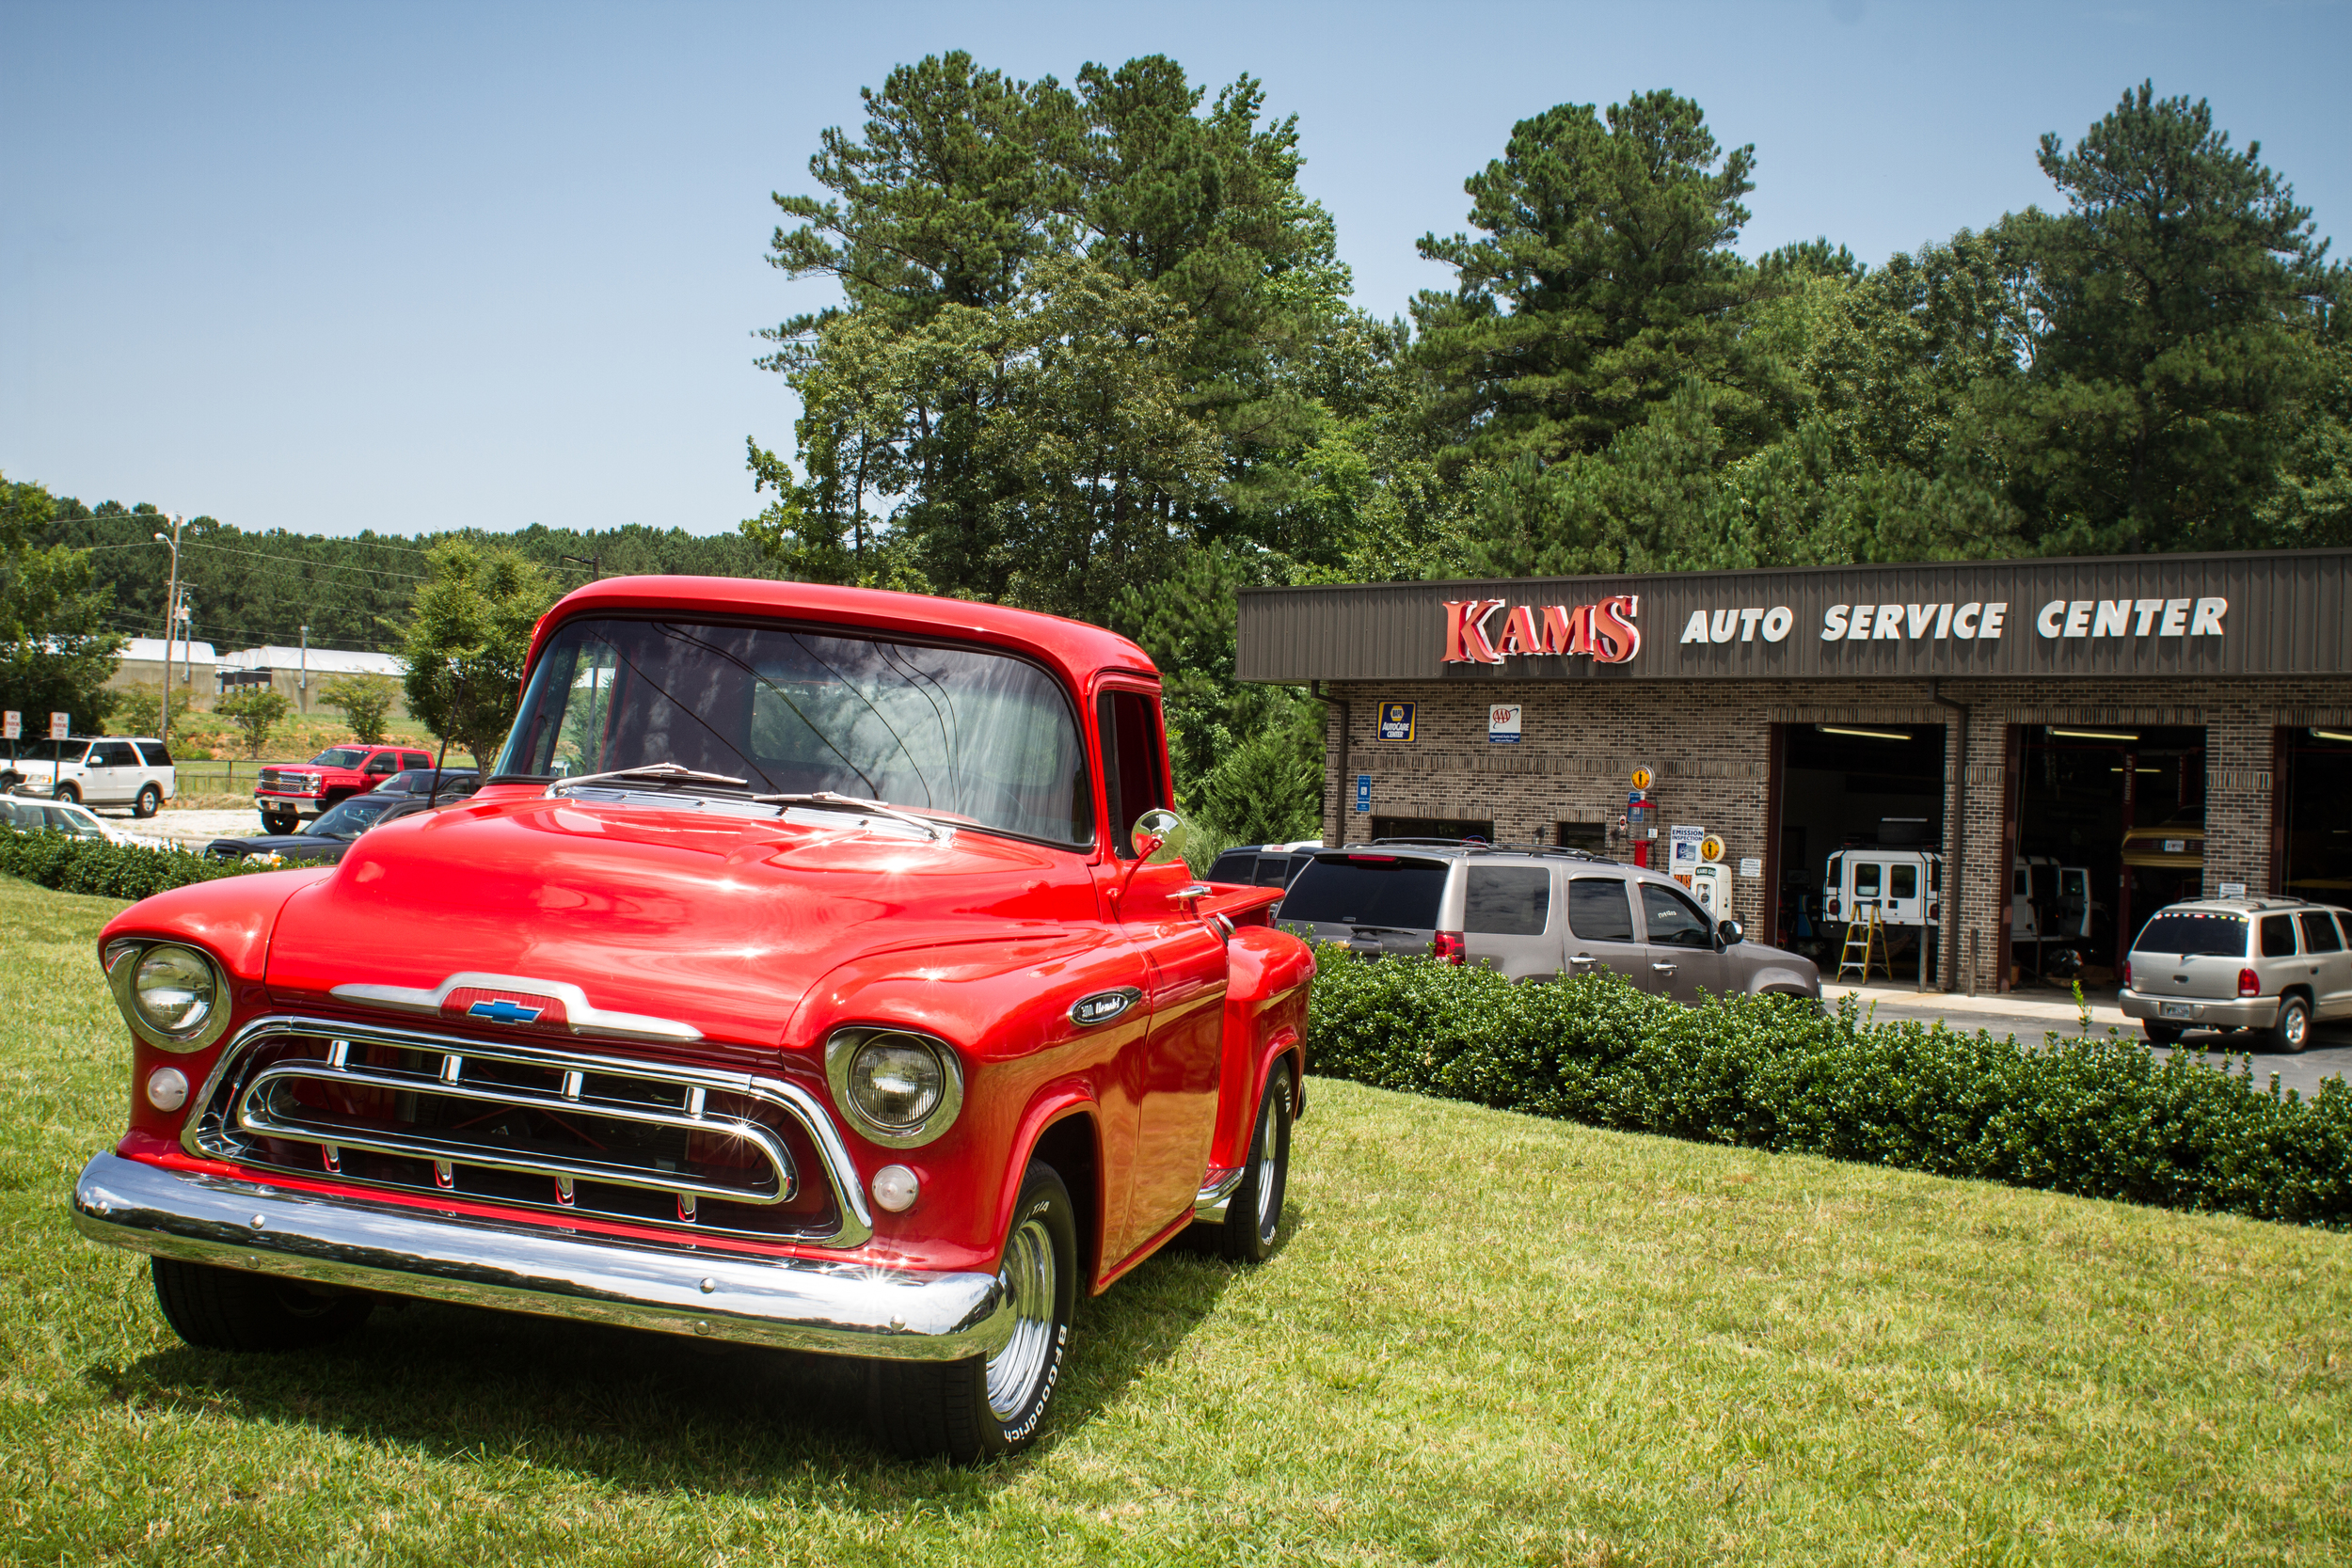 Kam's Auto Service Center 07.13.2016-14 PS.jpg